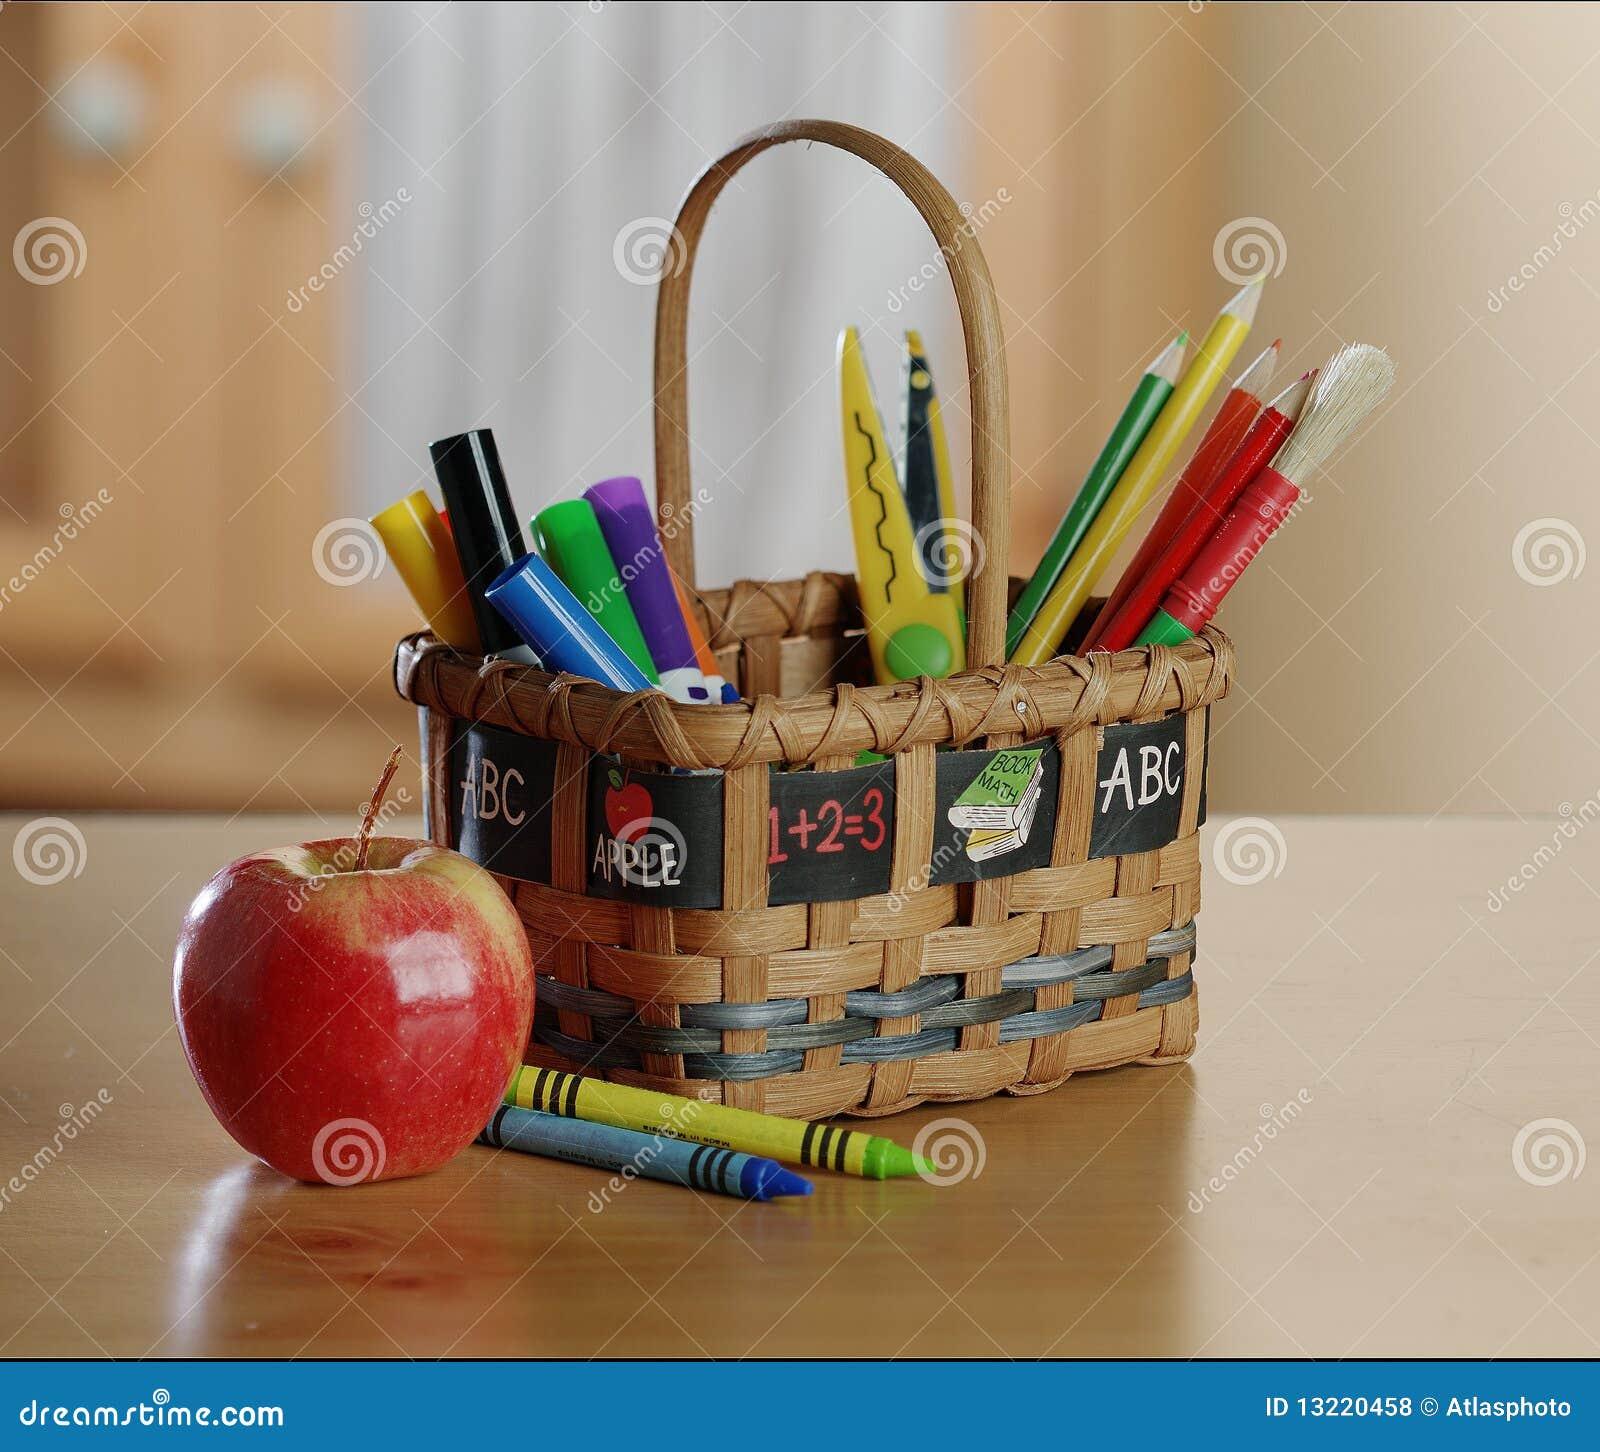 Kids Art And Craft Basket Stock Photo Image Of Craft 13220458